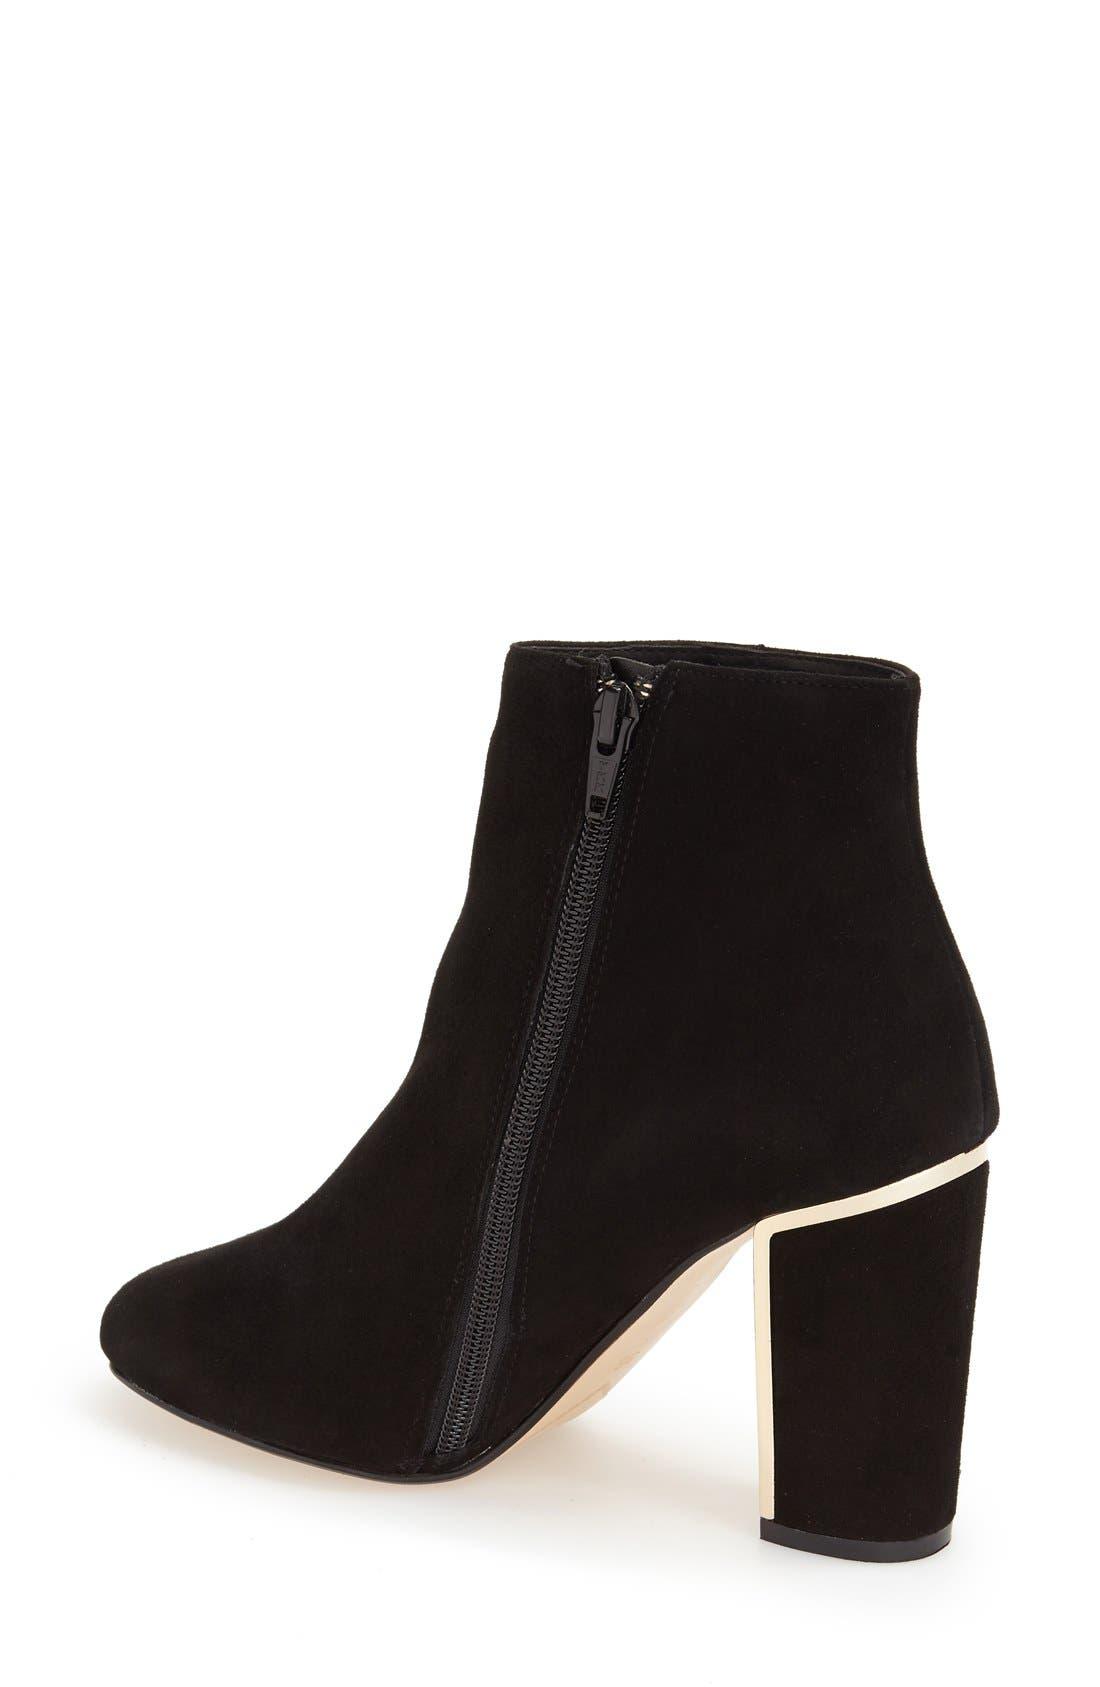 Alternate Image 3  - Dune London 'Otta' Ankle Bootie(Women)